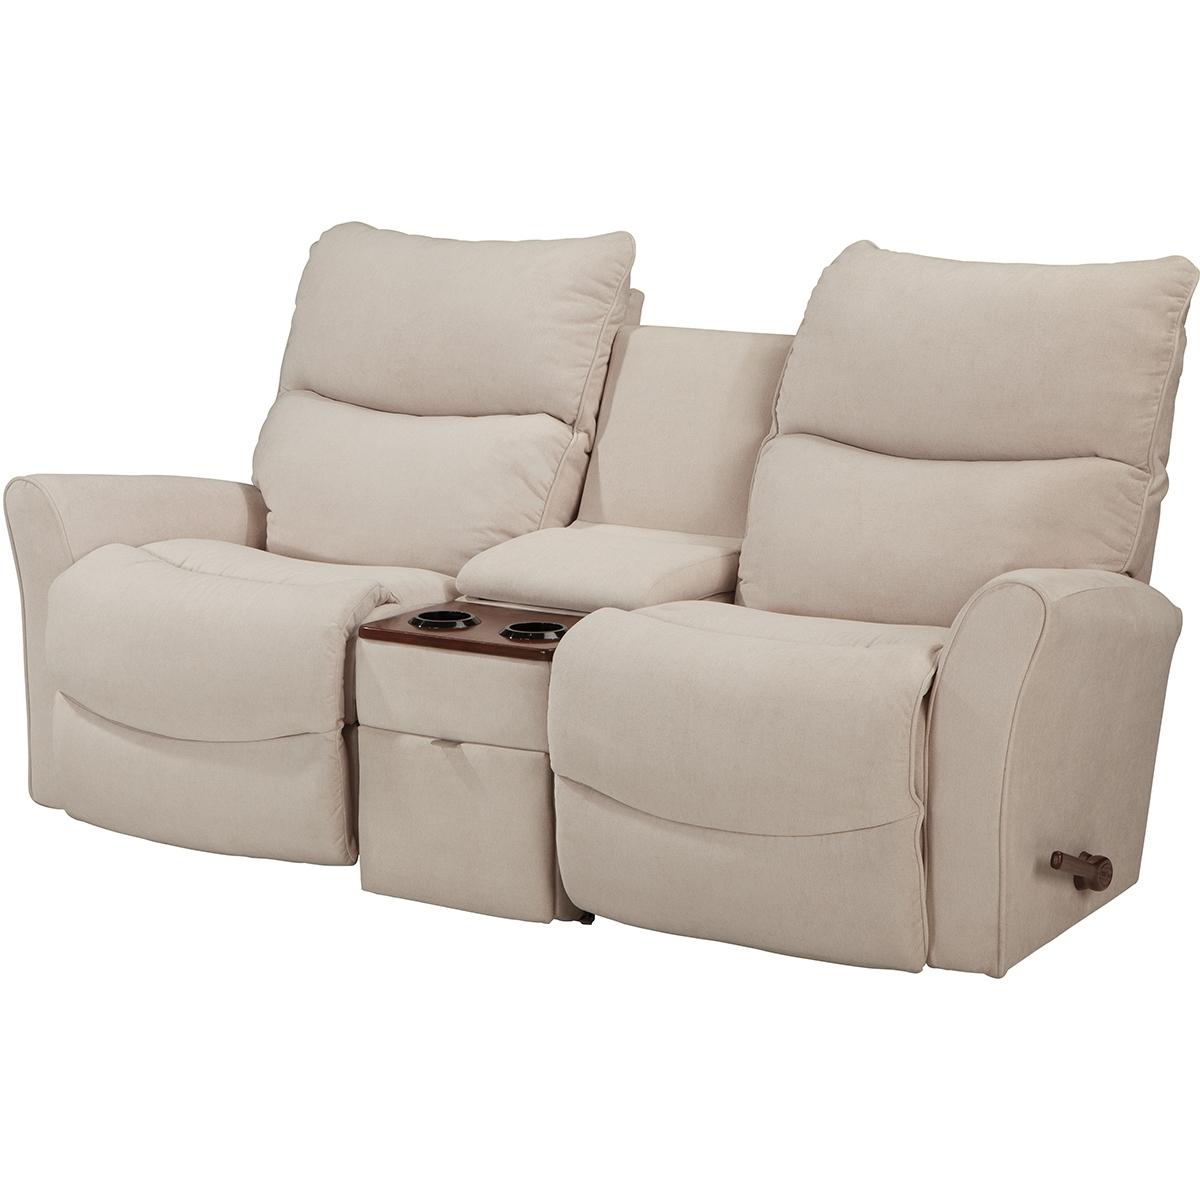 La Z Boy In Favorite Lazy Boy Sectional Sofas (View 4 of 15)